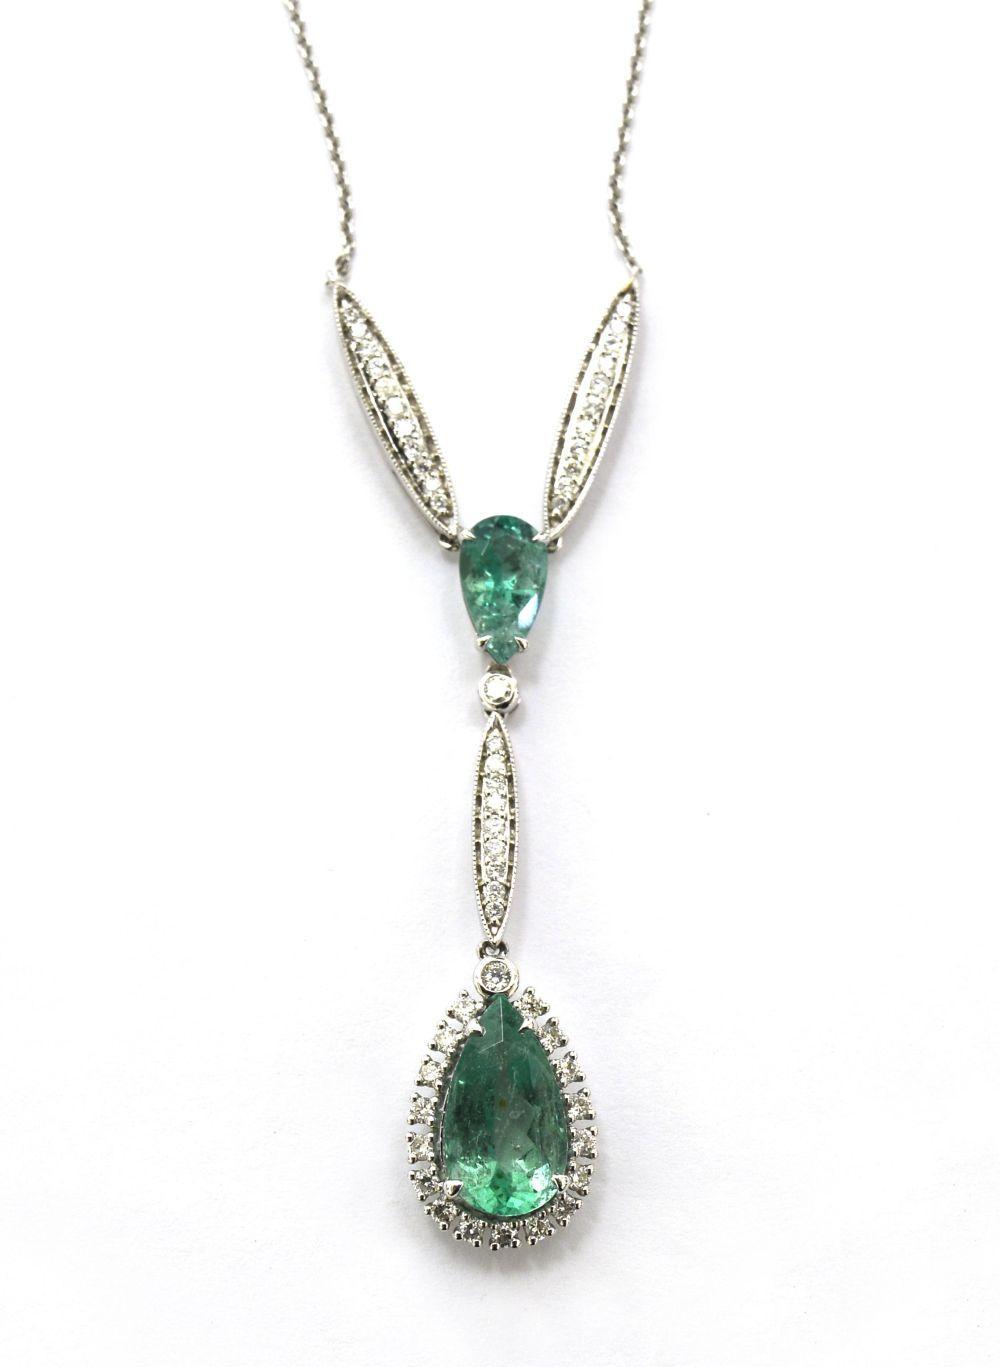 Emerald neckalce 4.20 carats